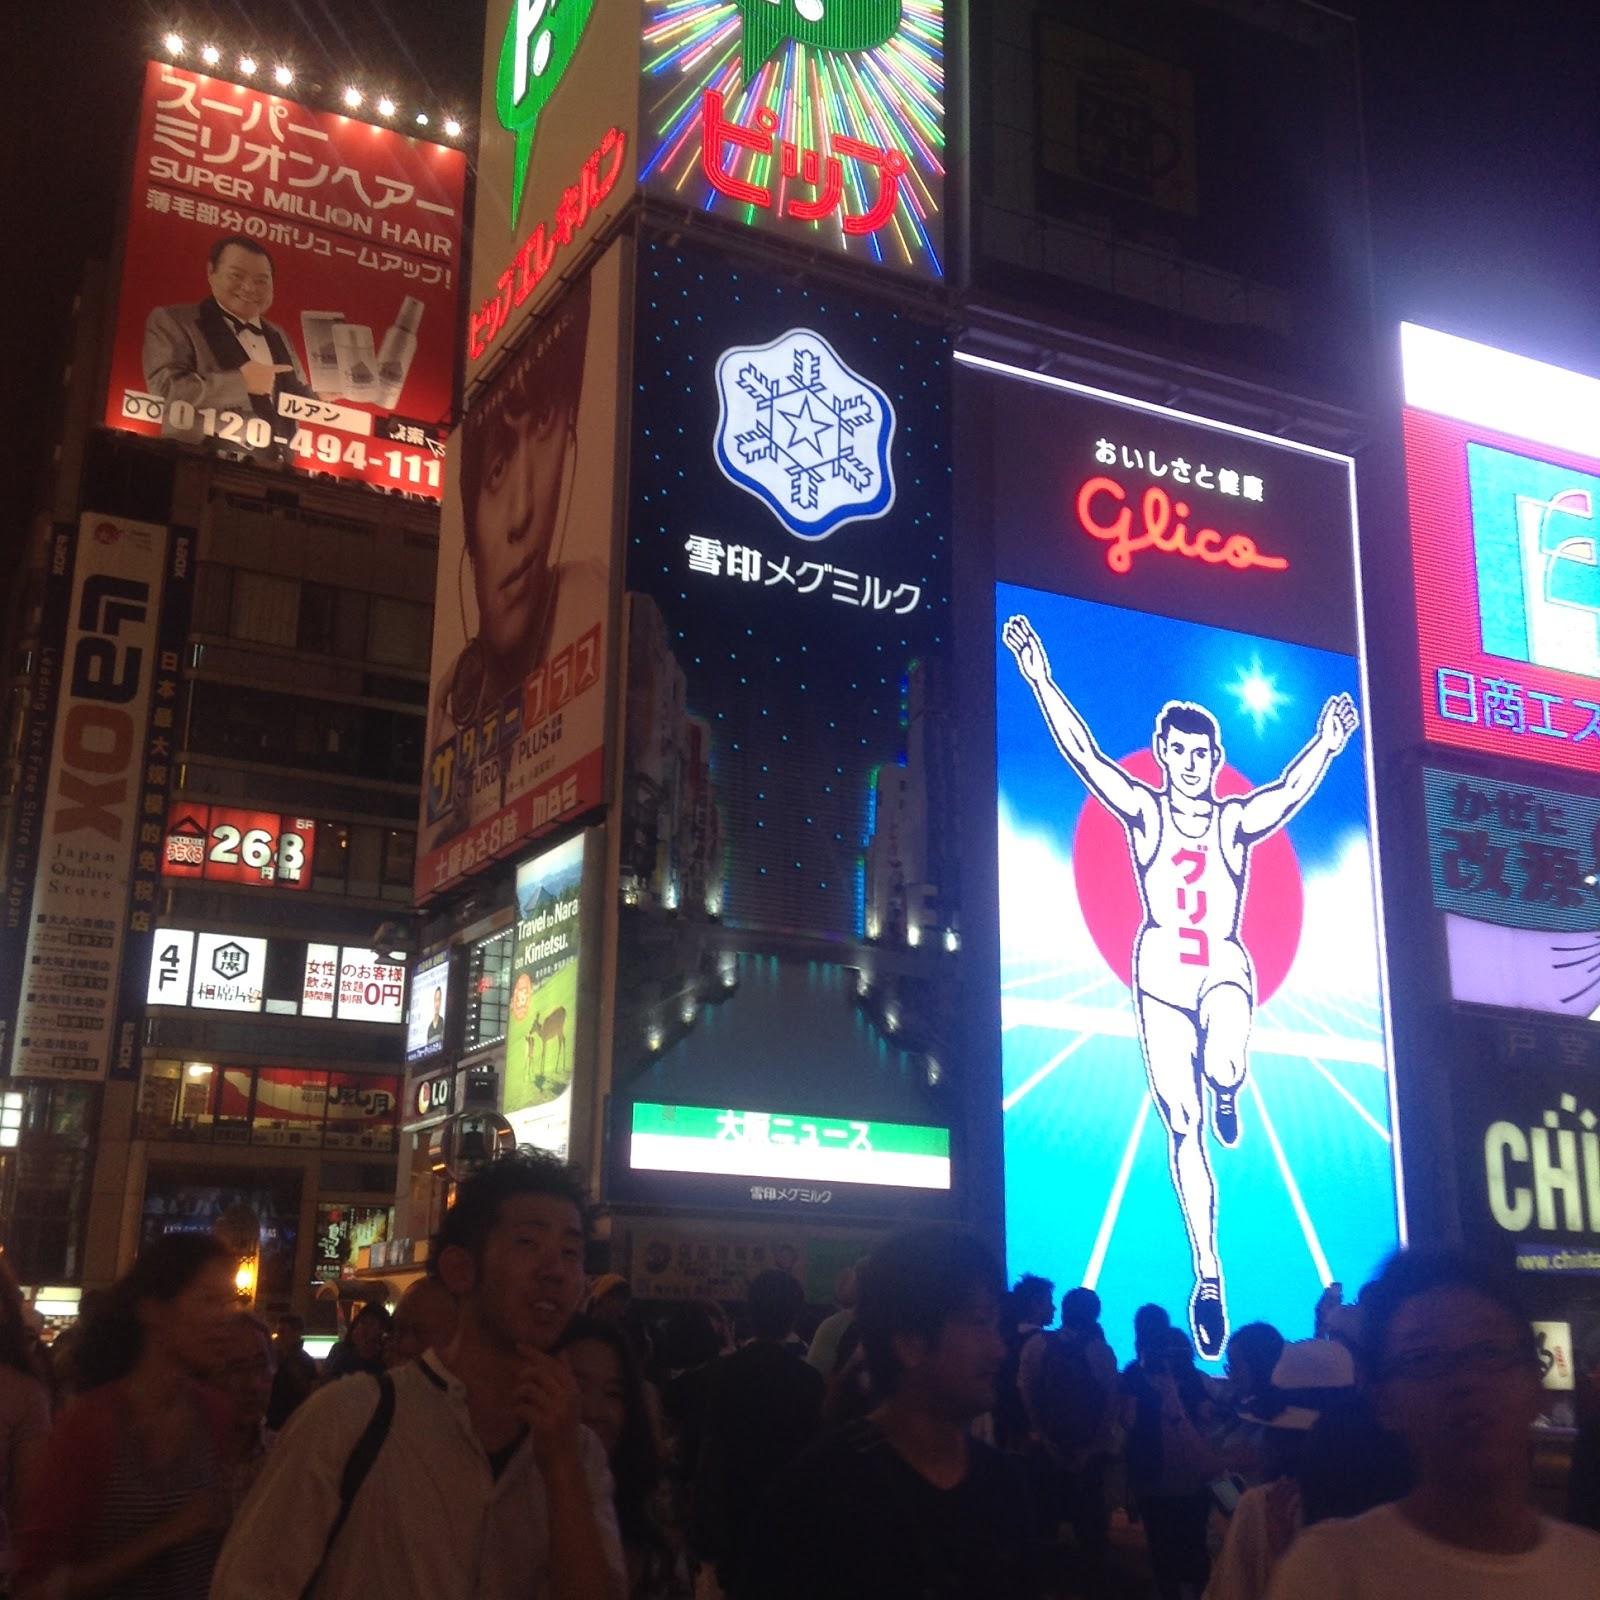 Glico man Dotonbori, Osaka